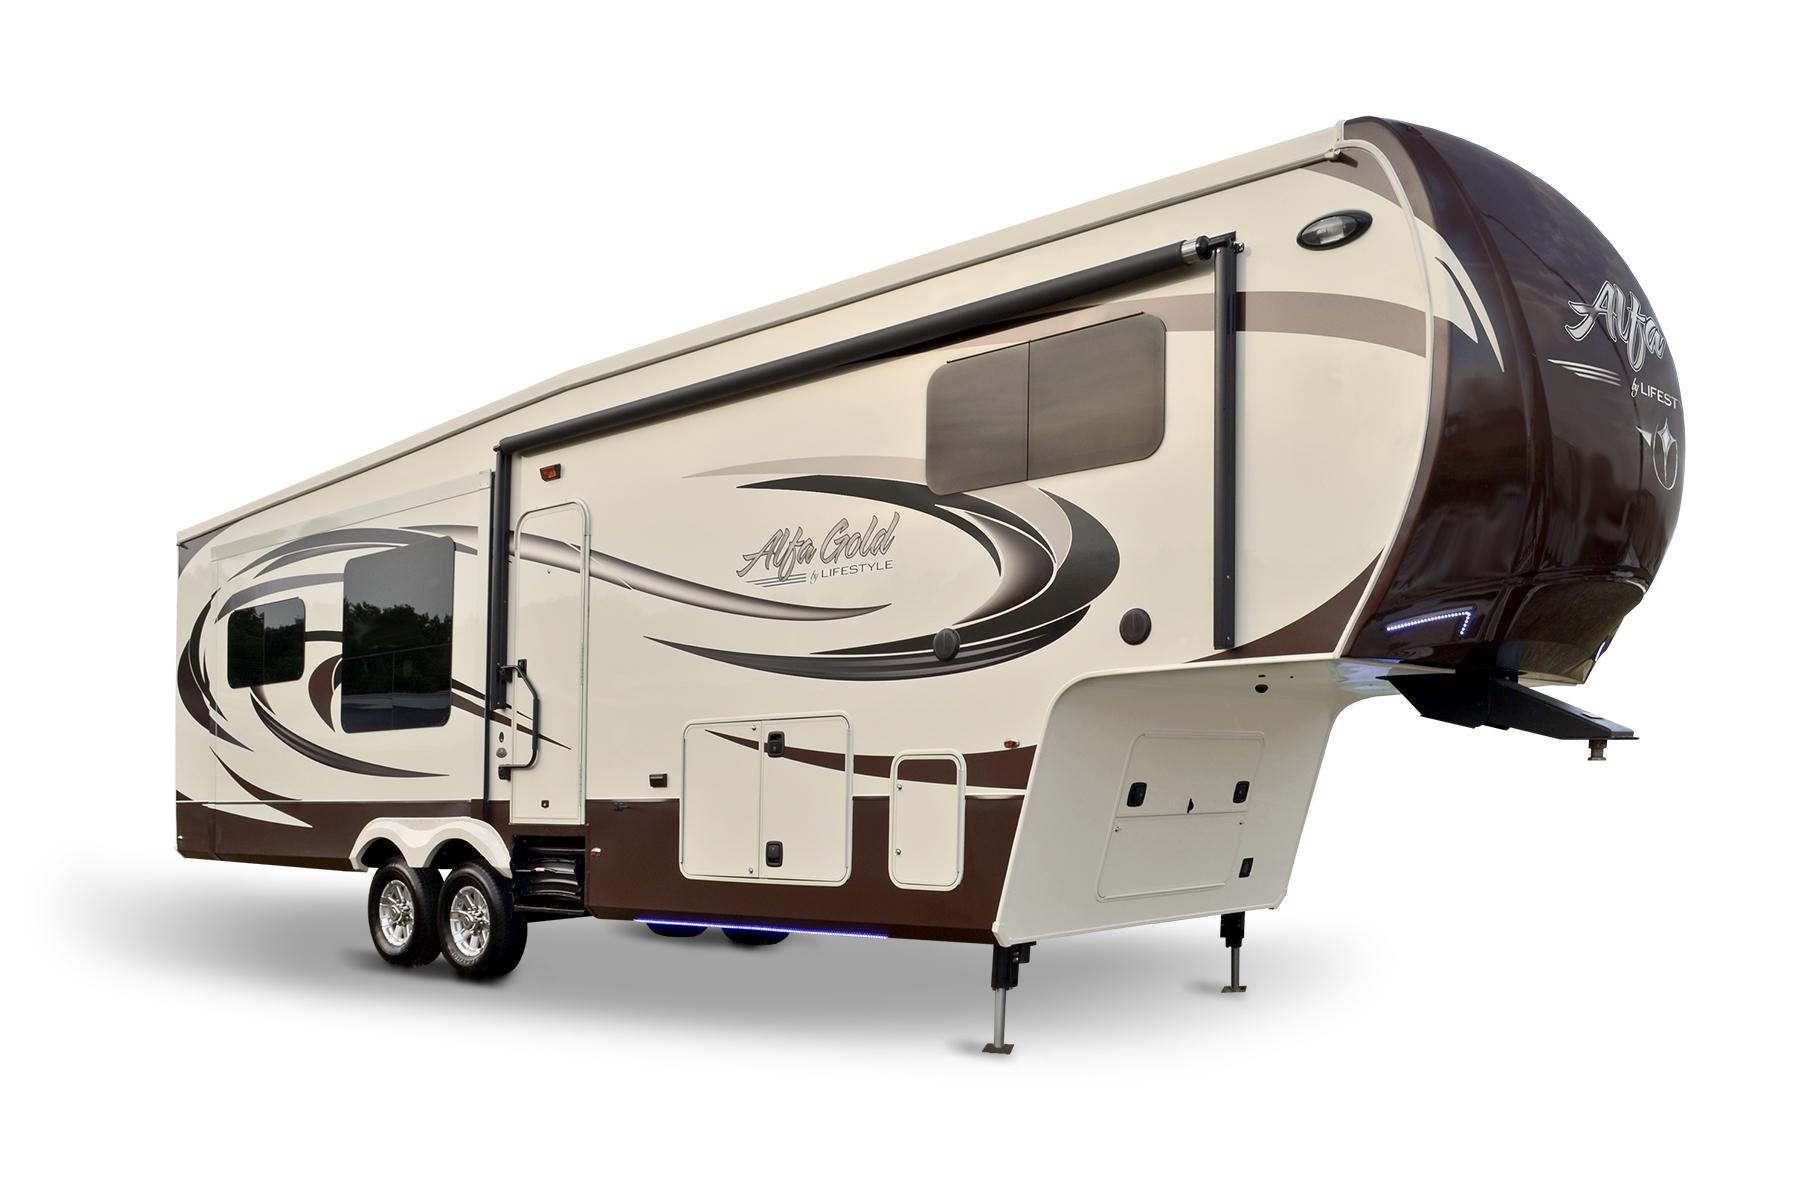 New Alfa Gold fiver by Lifestyle Luxury RV - RV Trader Insider